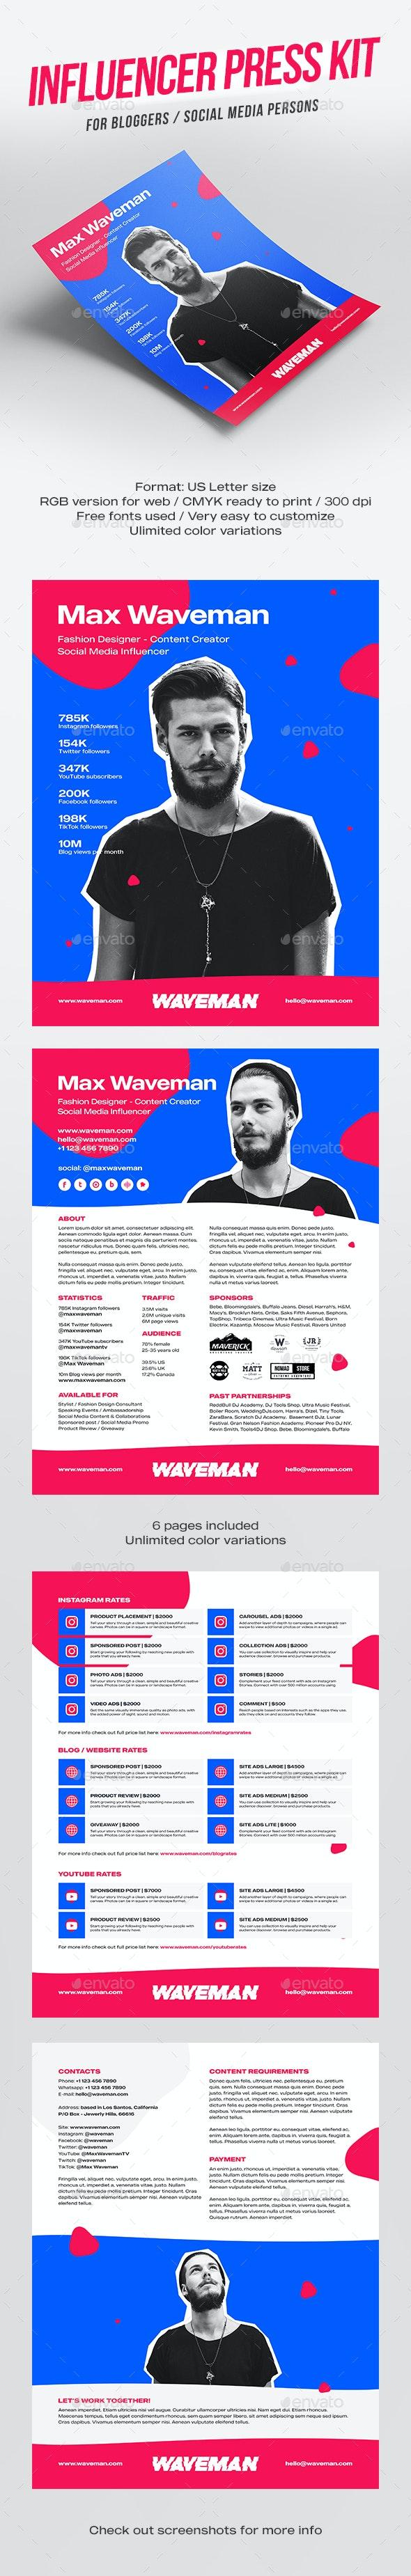 Influencer Press Kit Template for Social Media Marketing - Resumes Stationery